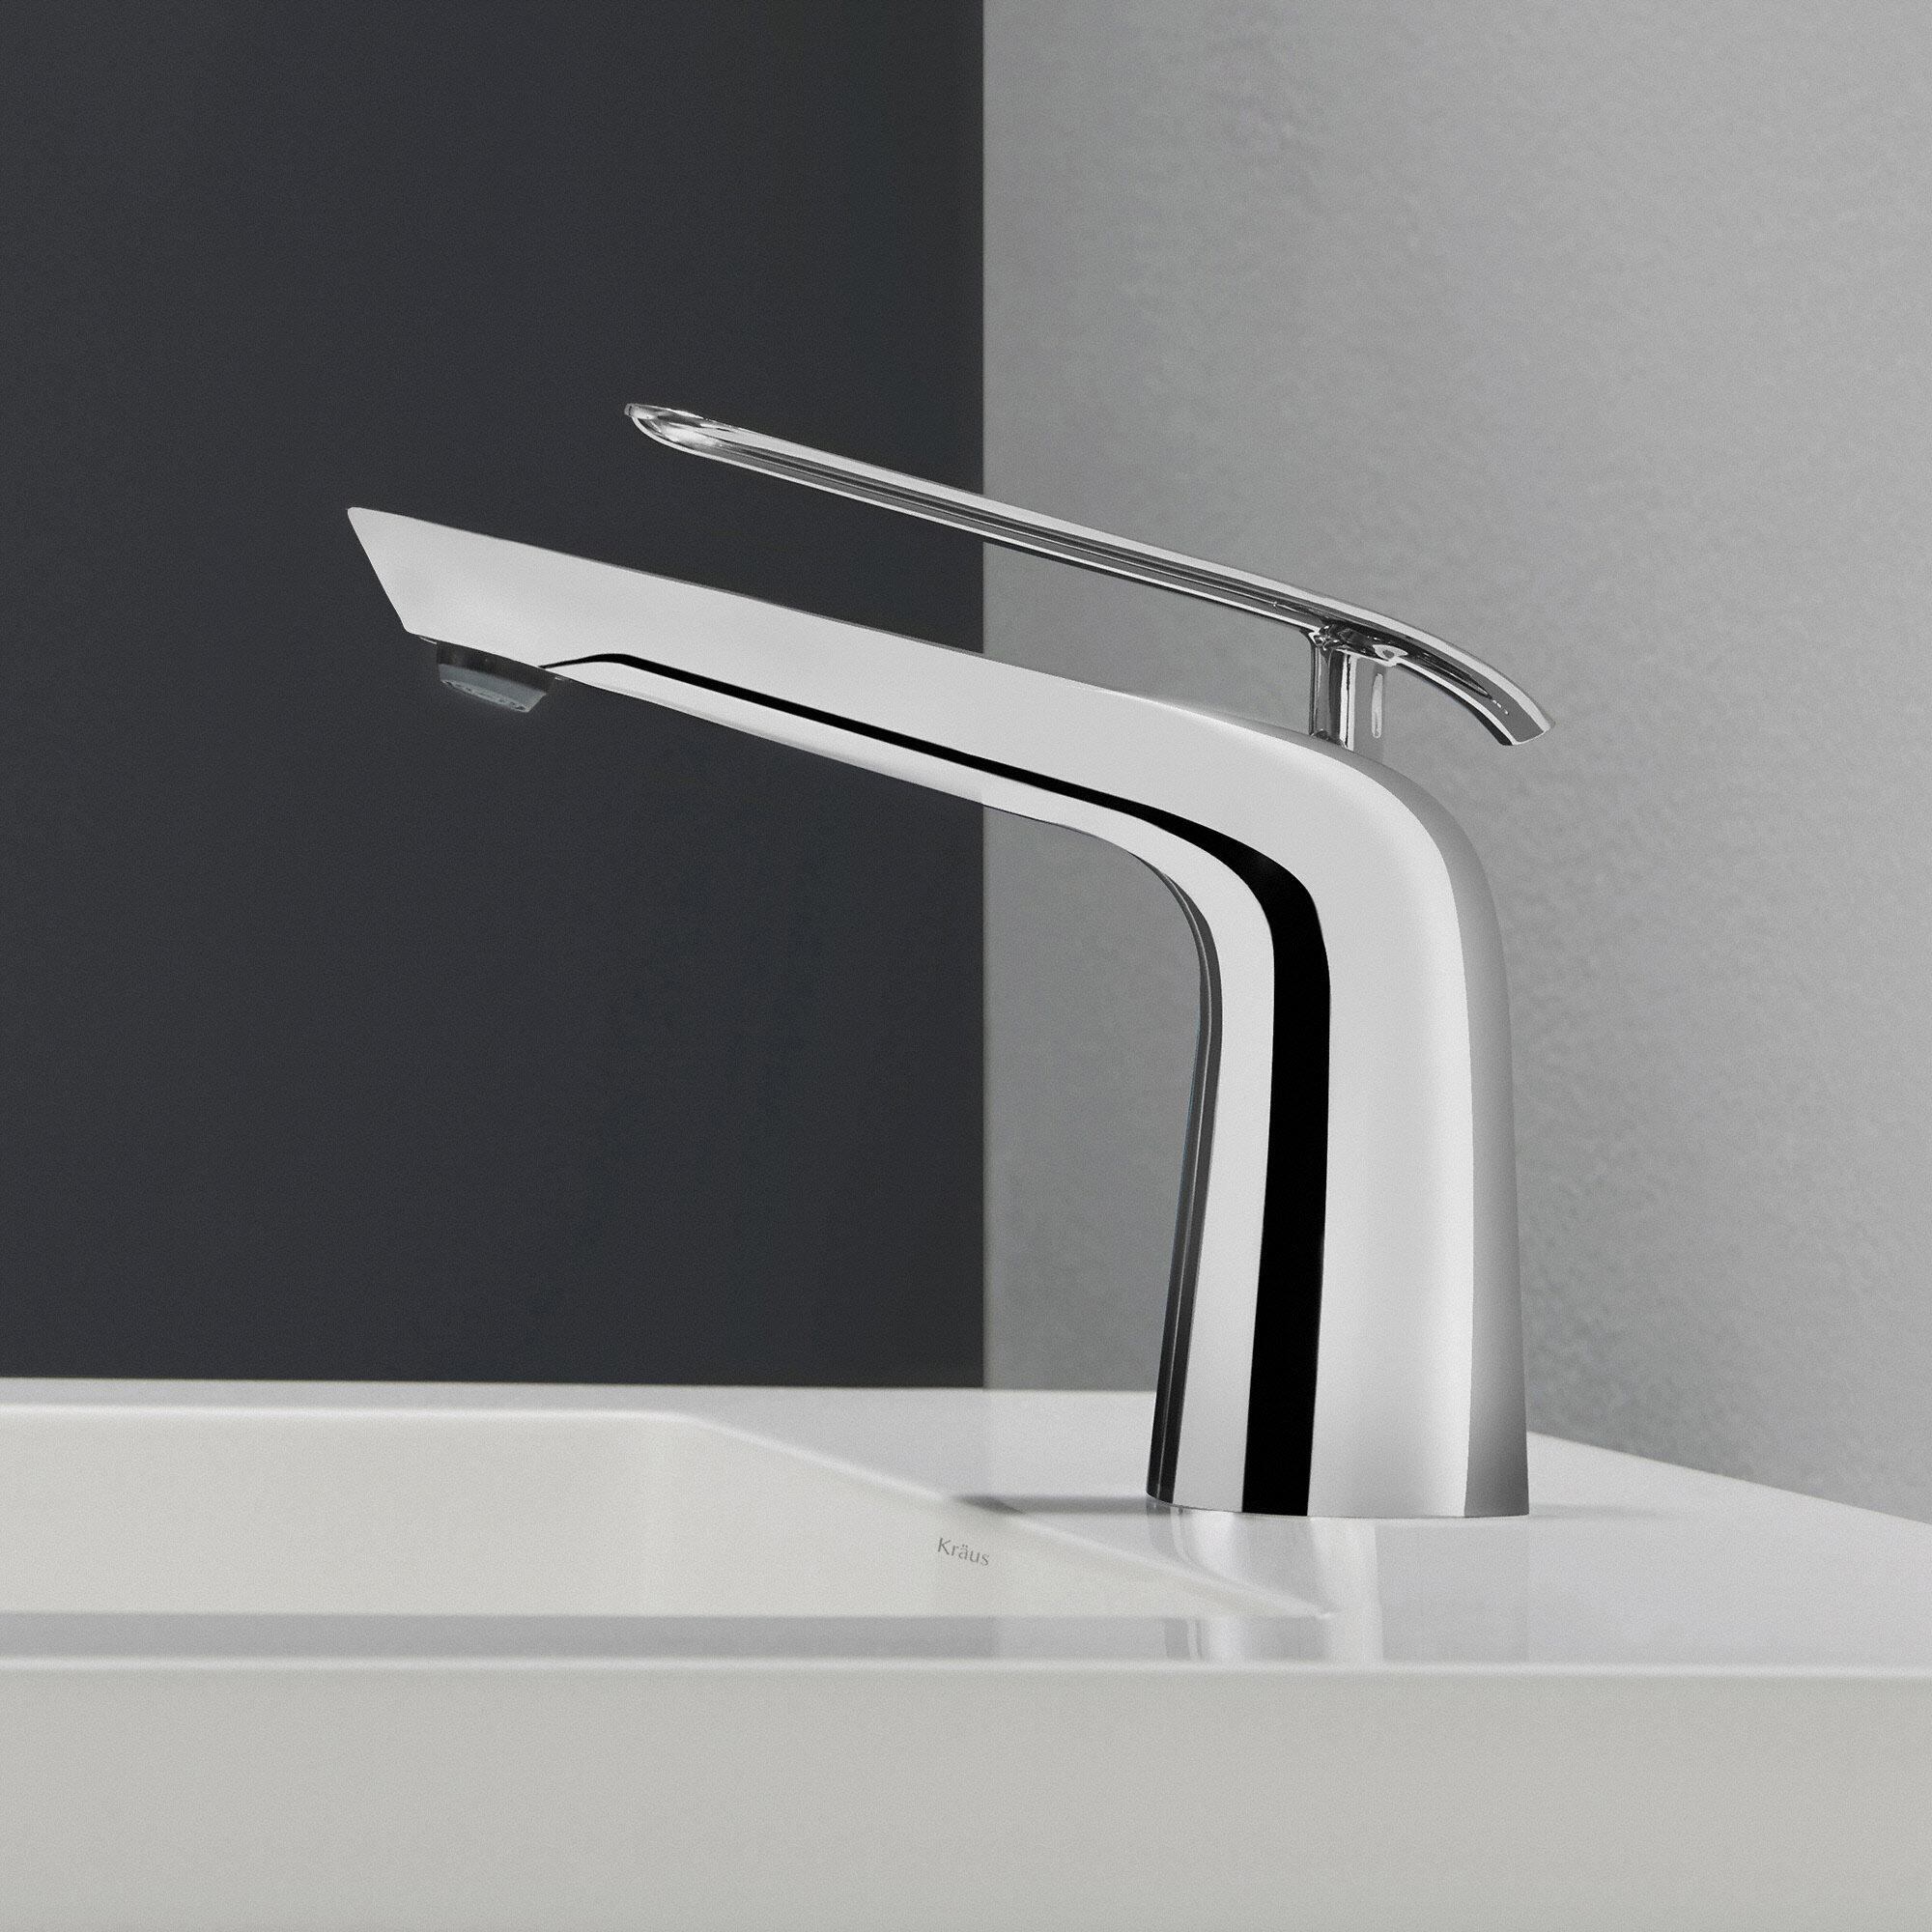 Kraus Seda Single Hole Bathroom Faucet & Reviews | Wayfair